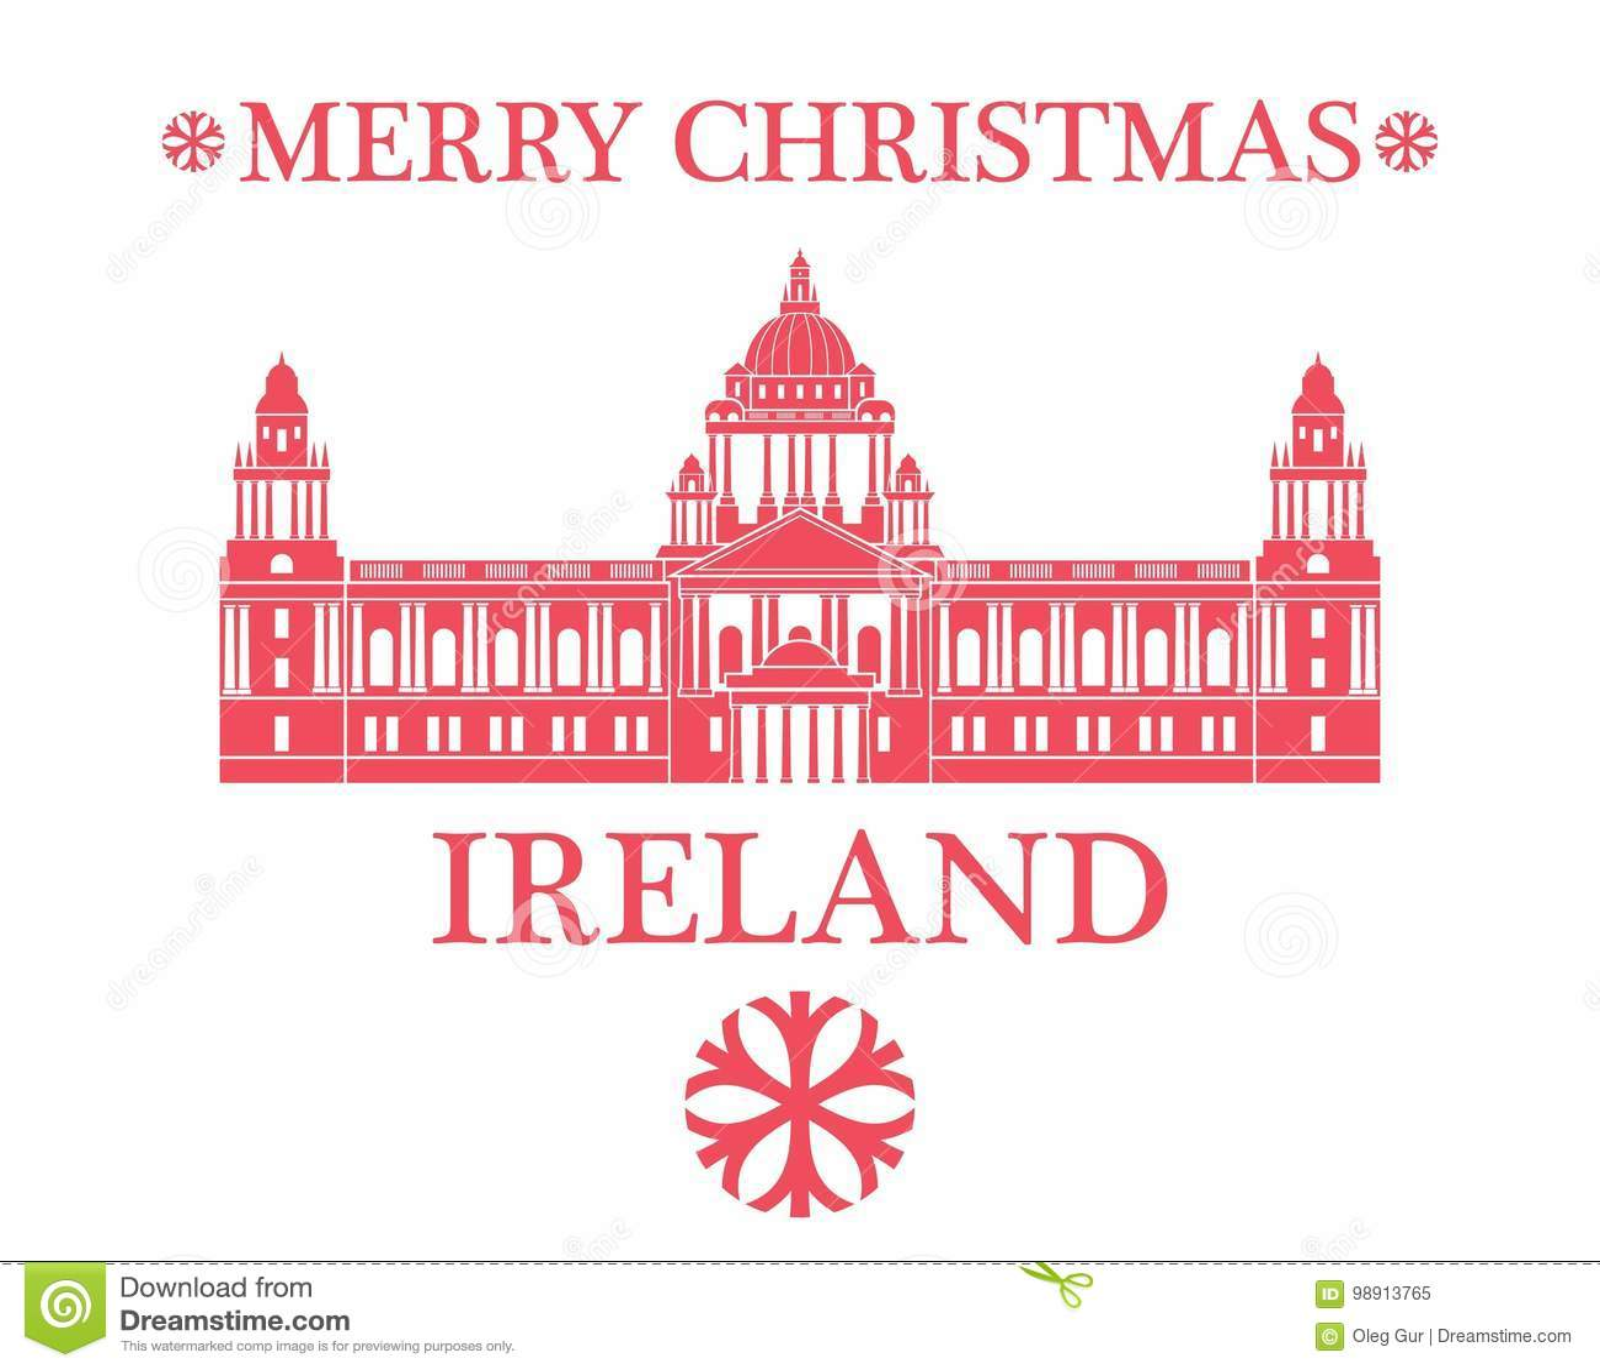 Merry Christmas Ireland stock vector. Illustration of dublin - 98913765